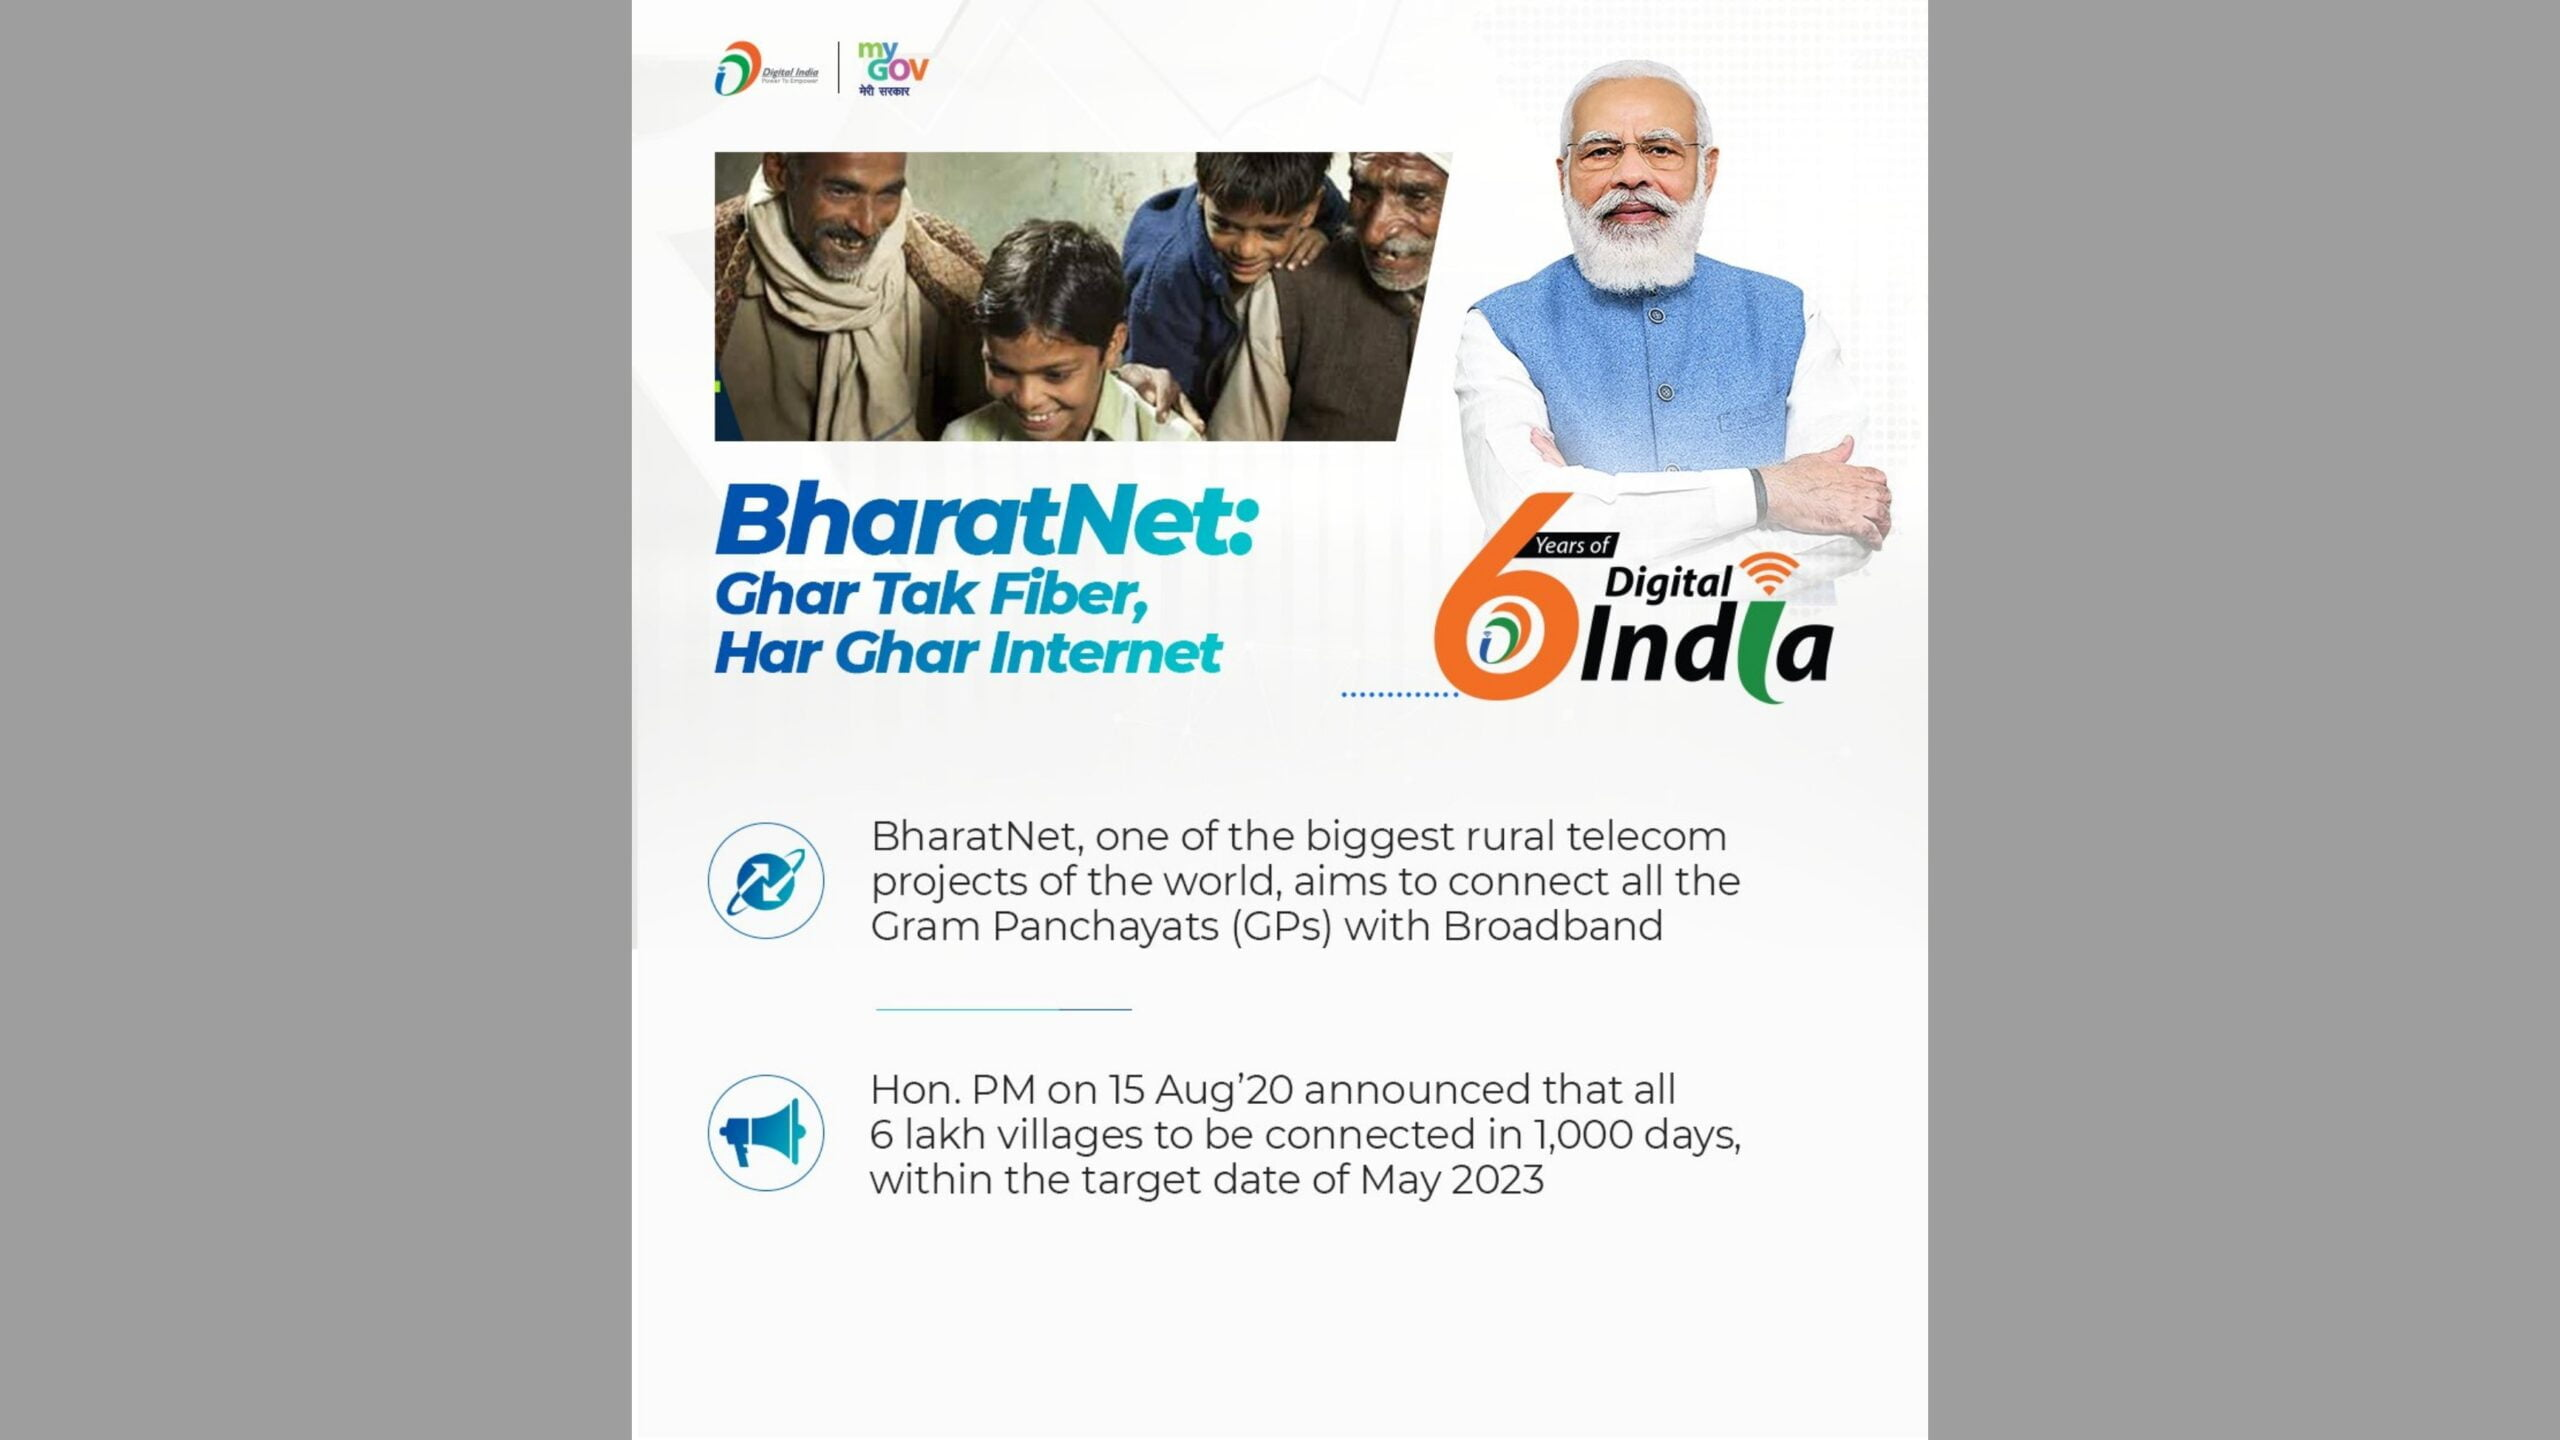 BharatNet Digital India scaled